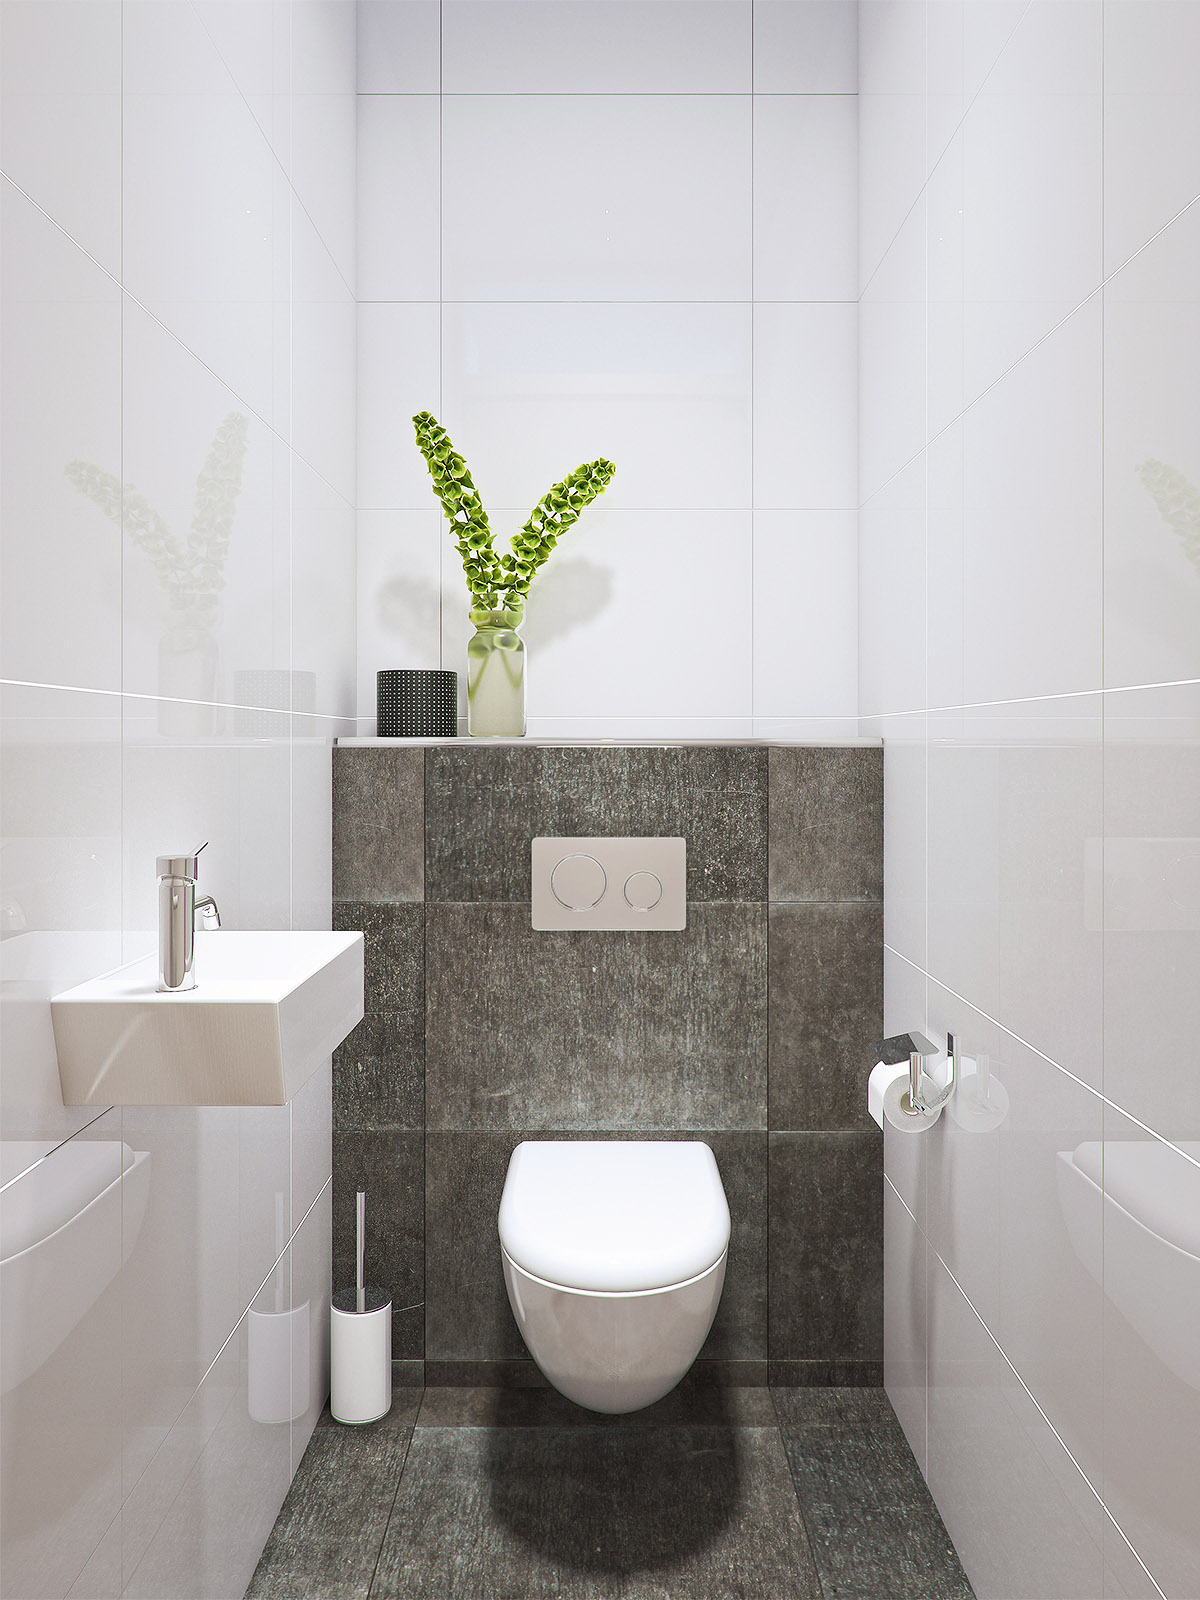 Toilet DWanimations detailvisualisatie